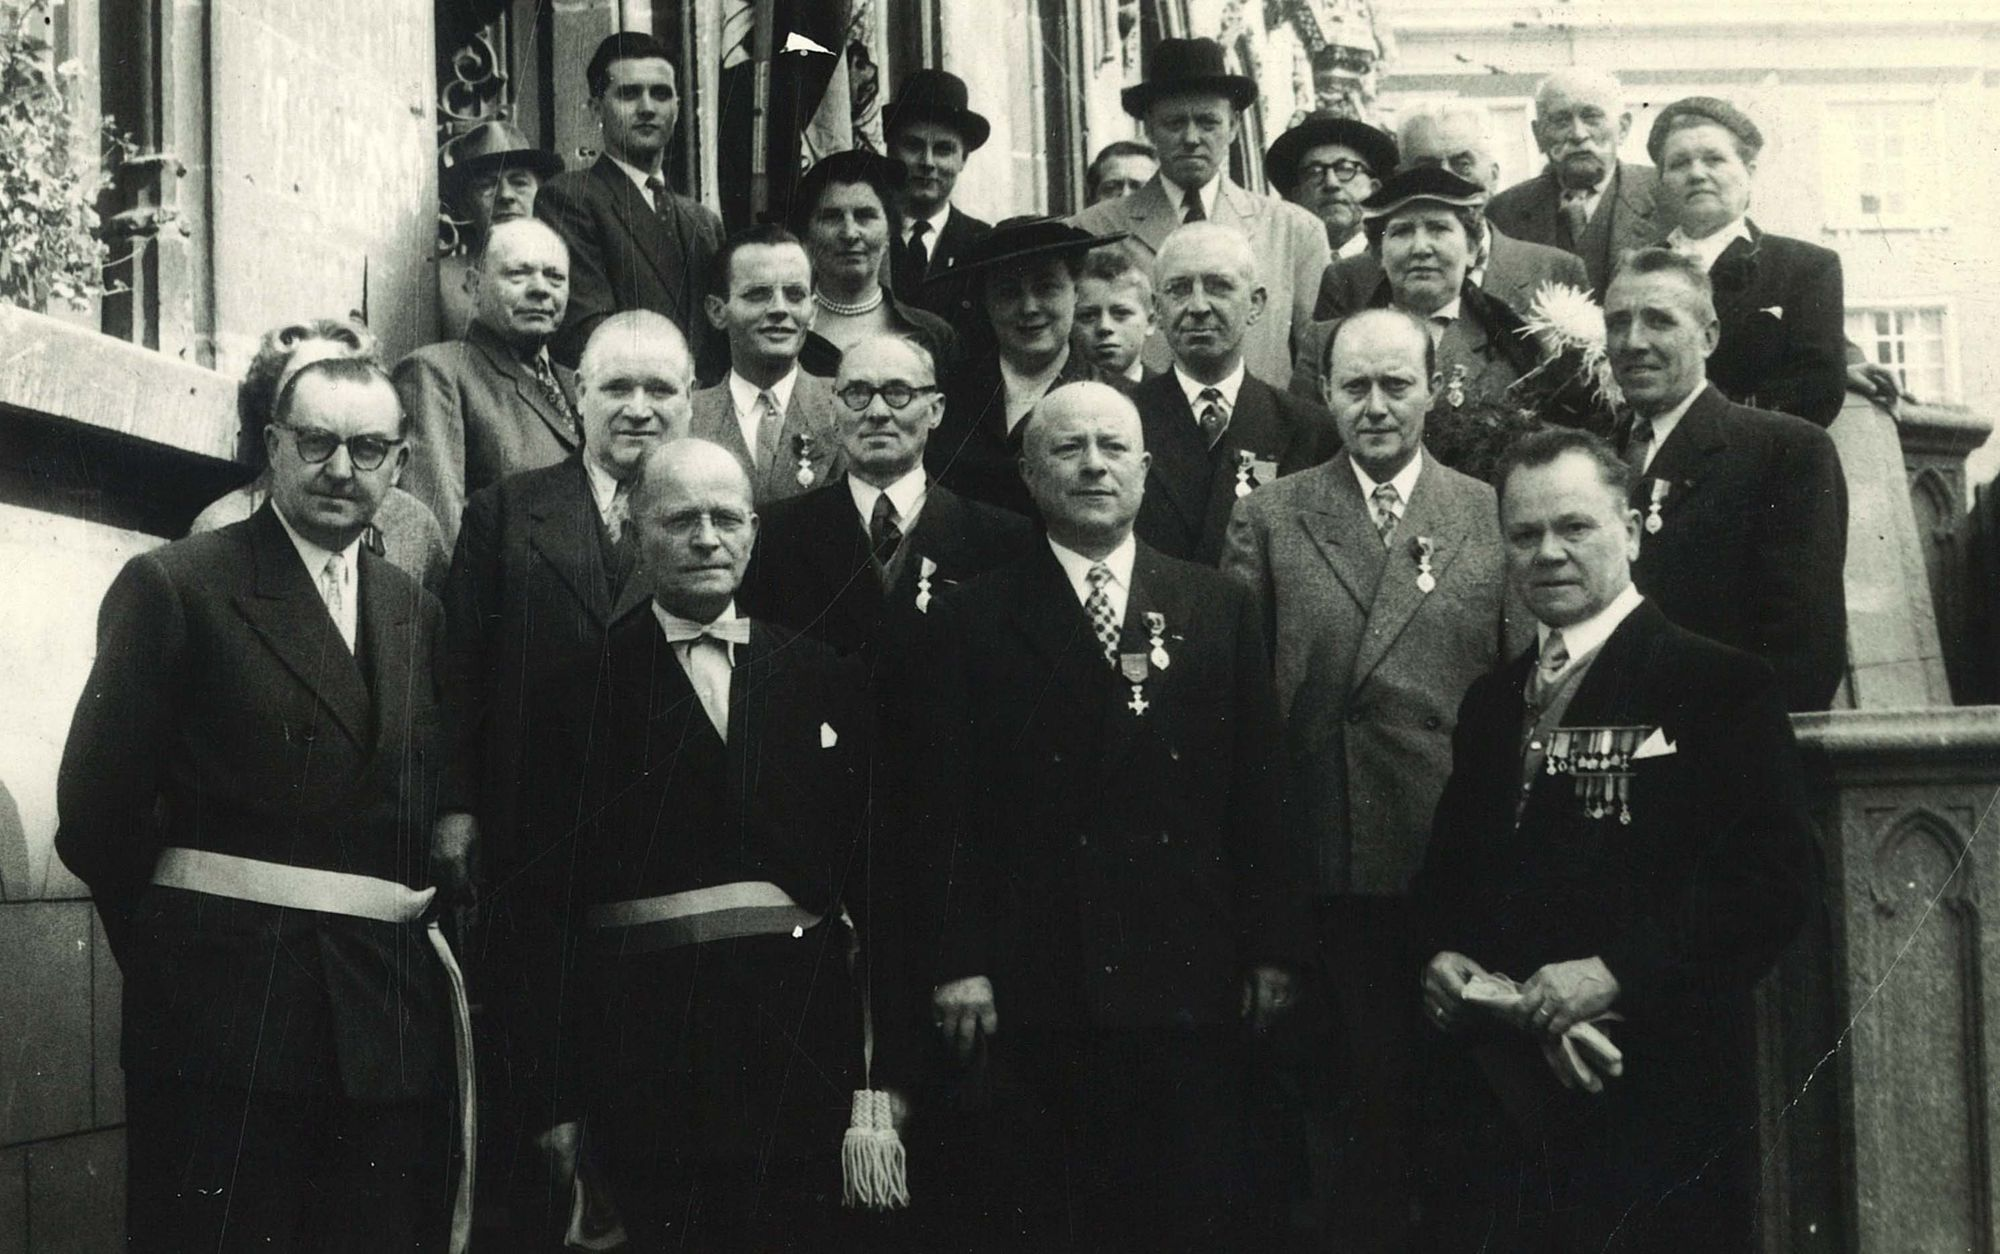 Groepsfoto met Jules Coussens voor het stadhuis